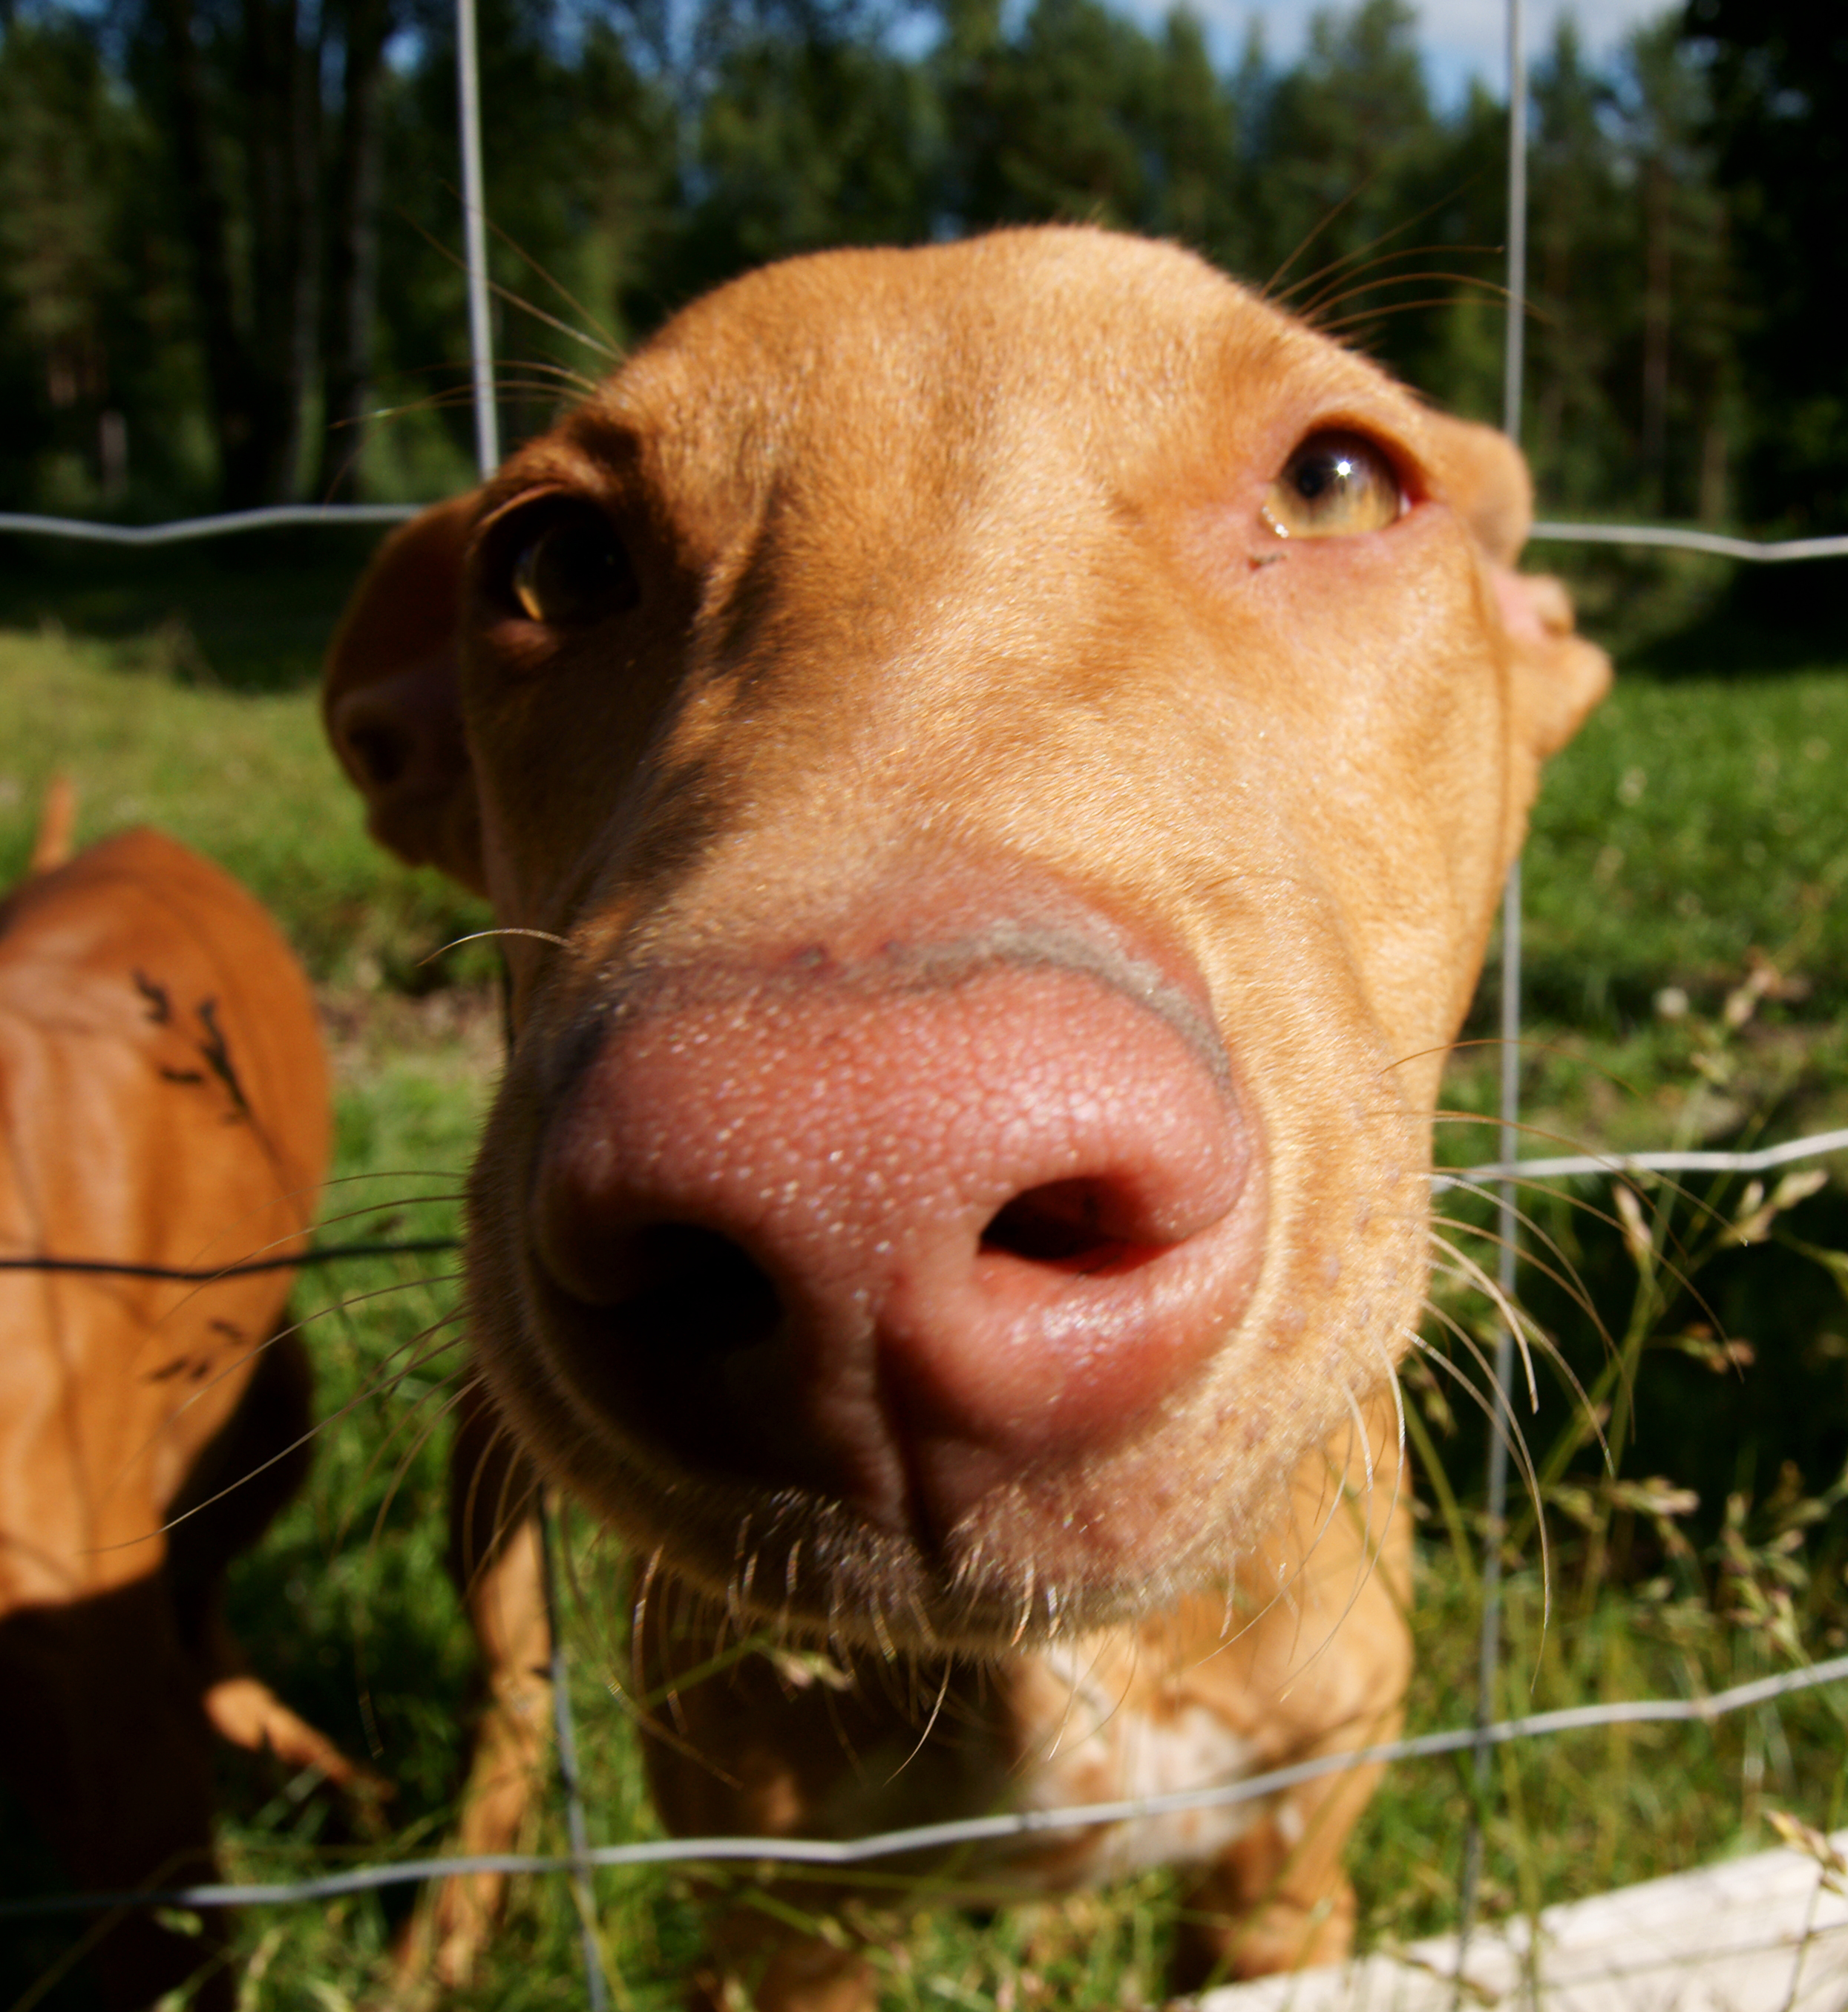 Nosy Pharaoh Hound dog  wallpaper